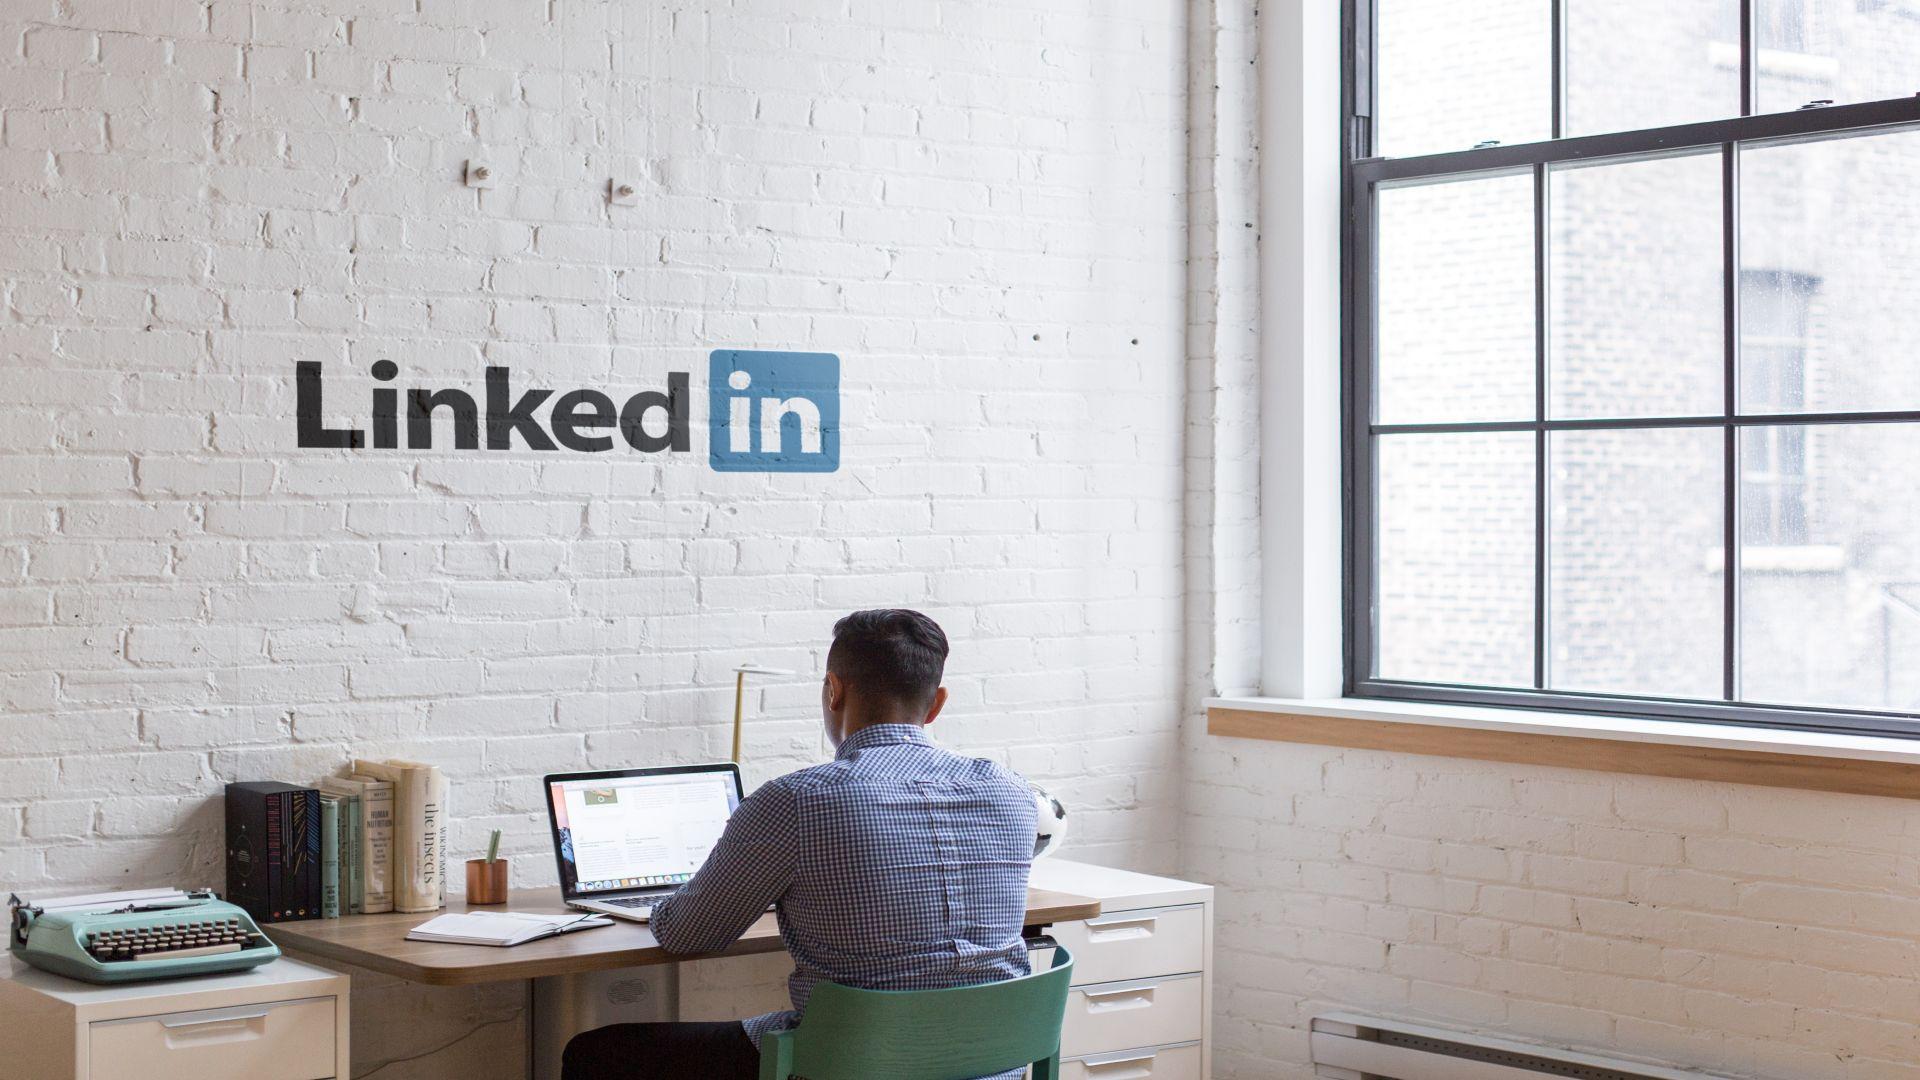 Networking LinkedIn